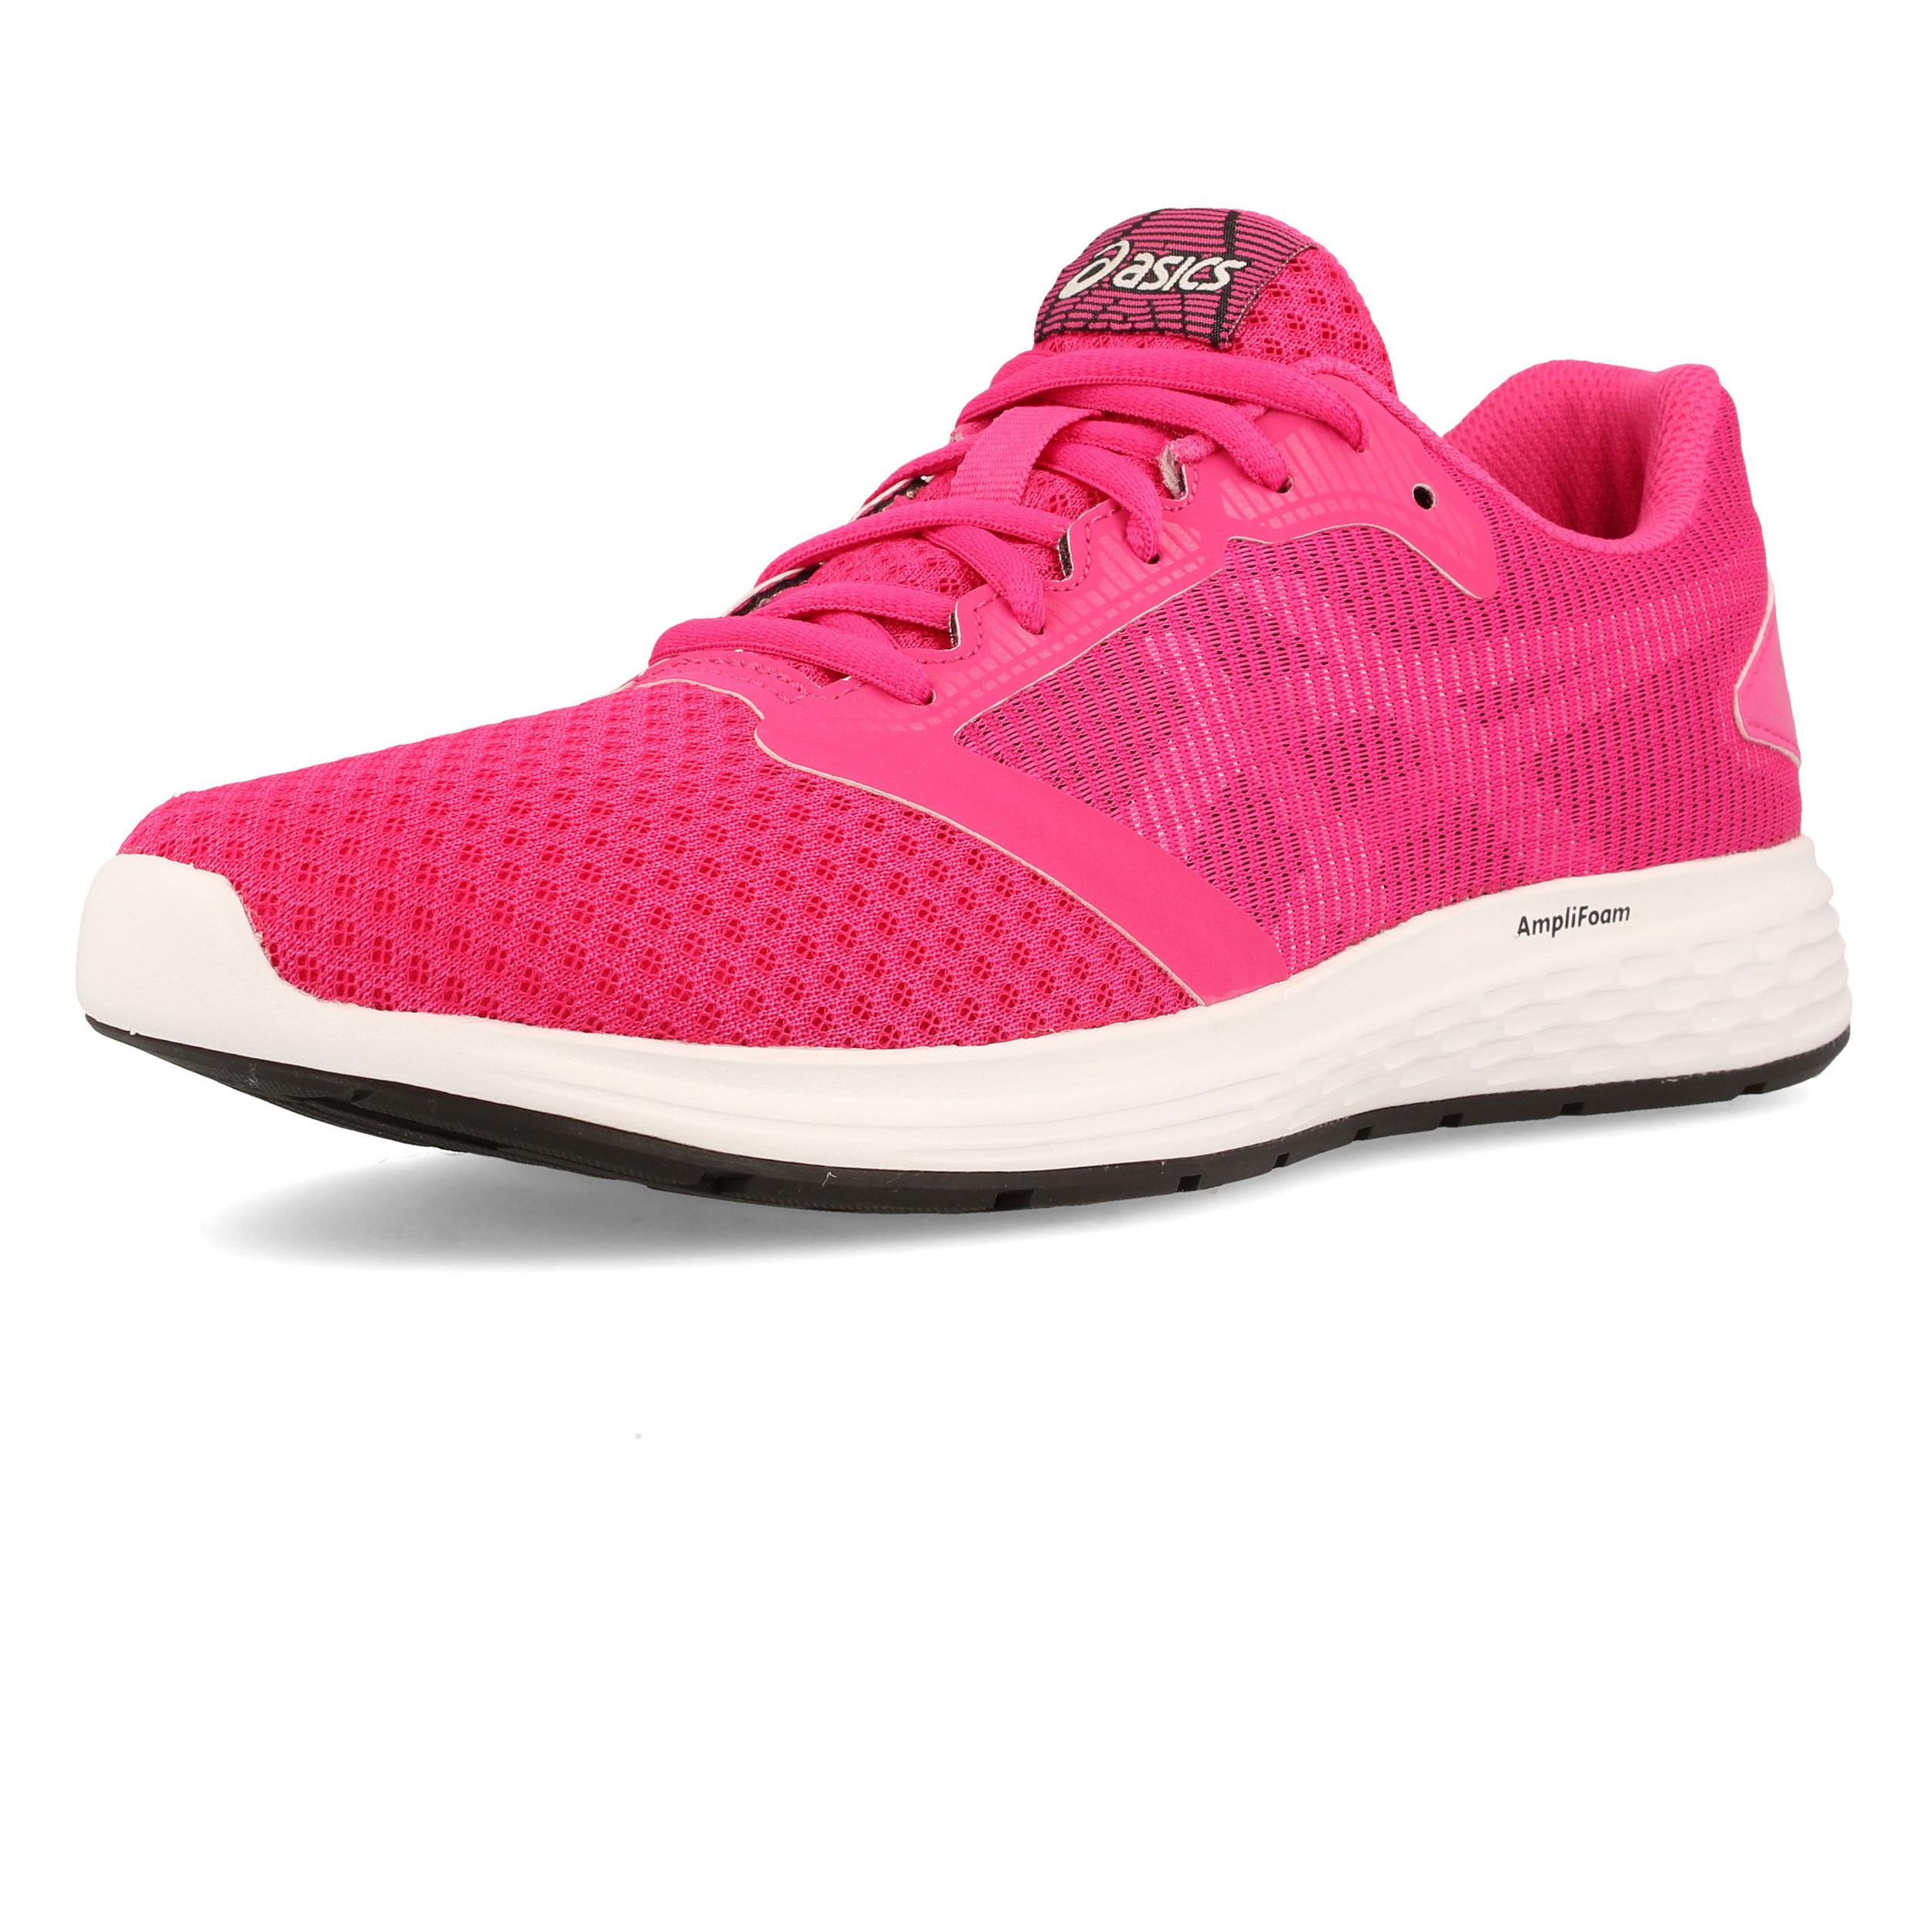 Asics Baskets Femme Patriot 10 Chaussures De Course Baskets Asics Baskets ROSE SPORT respirant fe6087